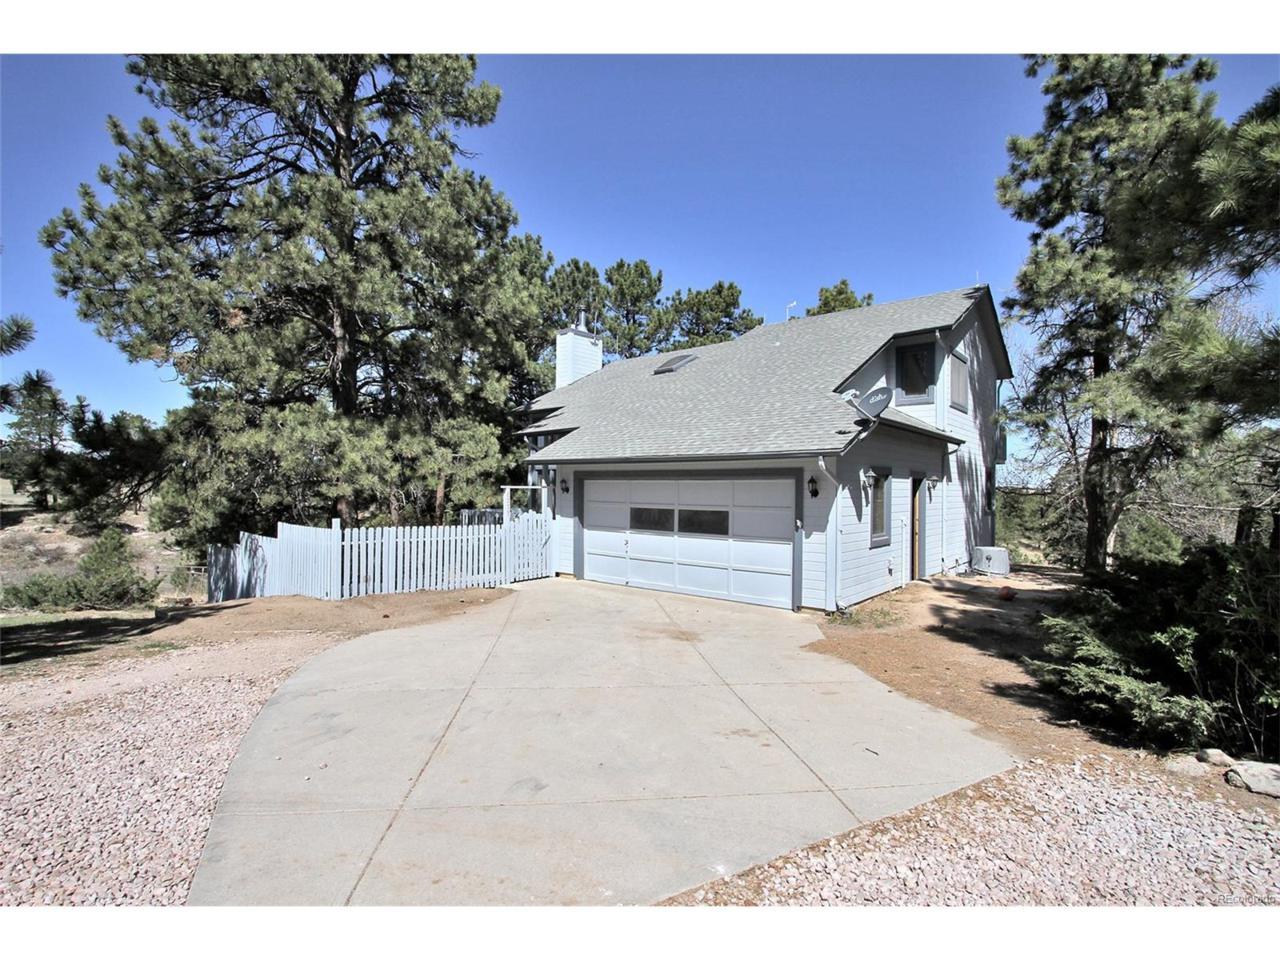 6555 County Road 98, Elbert, CO 80106 (MLS #6597828) :: 8z Real Estate